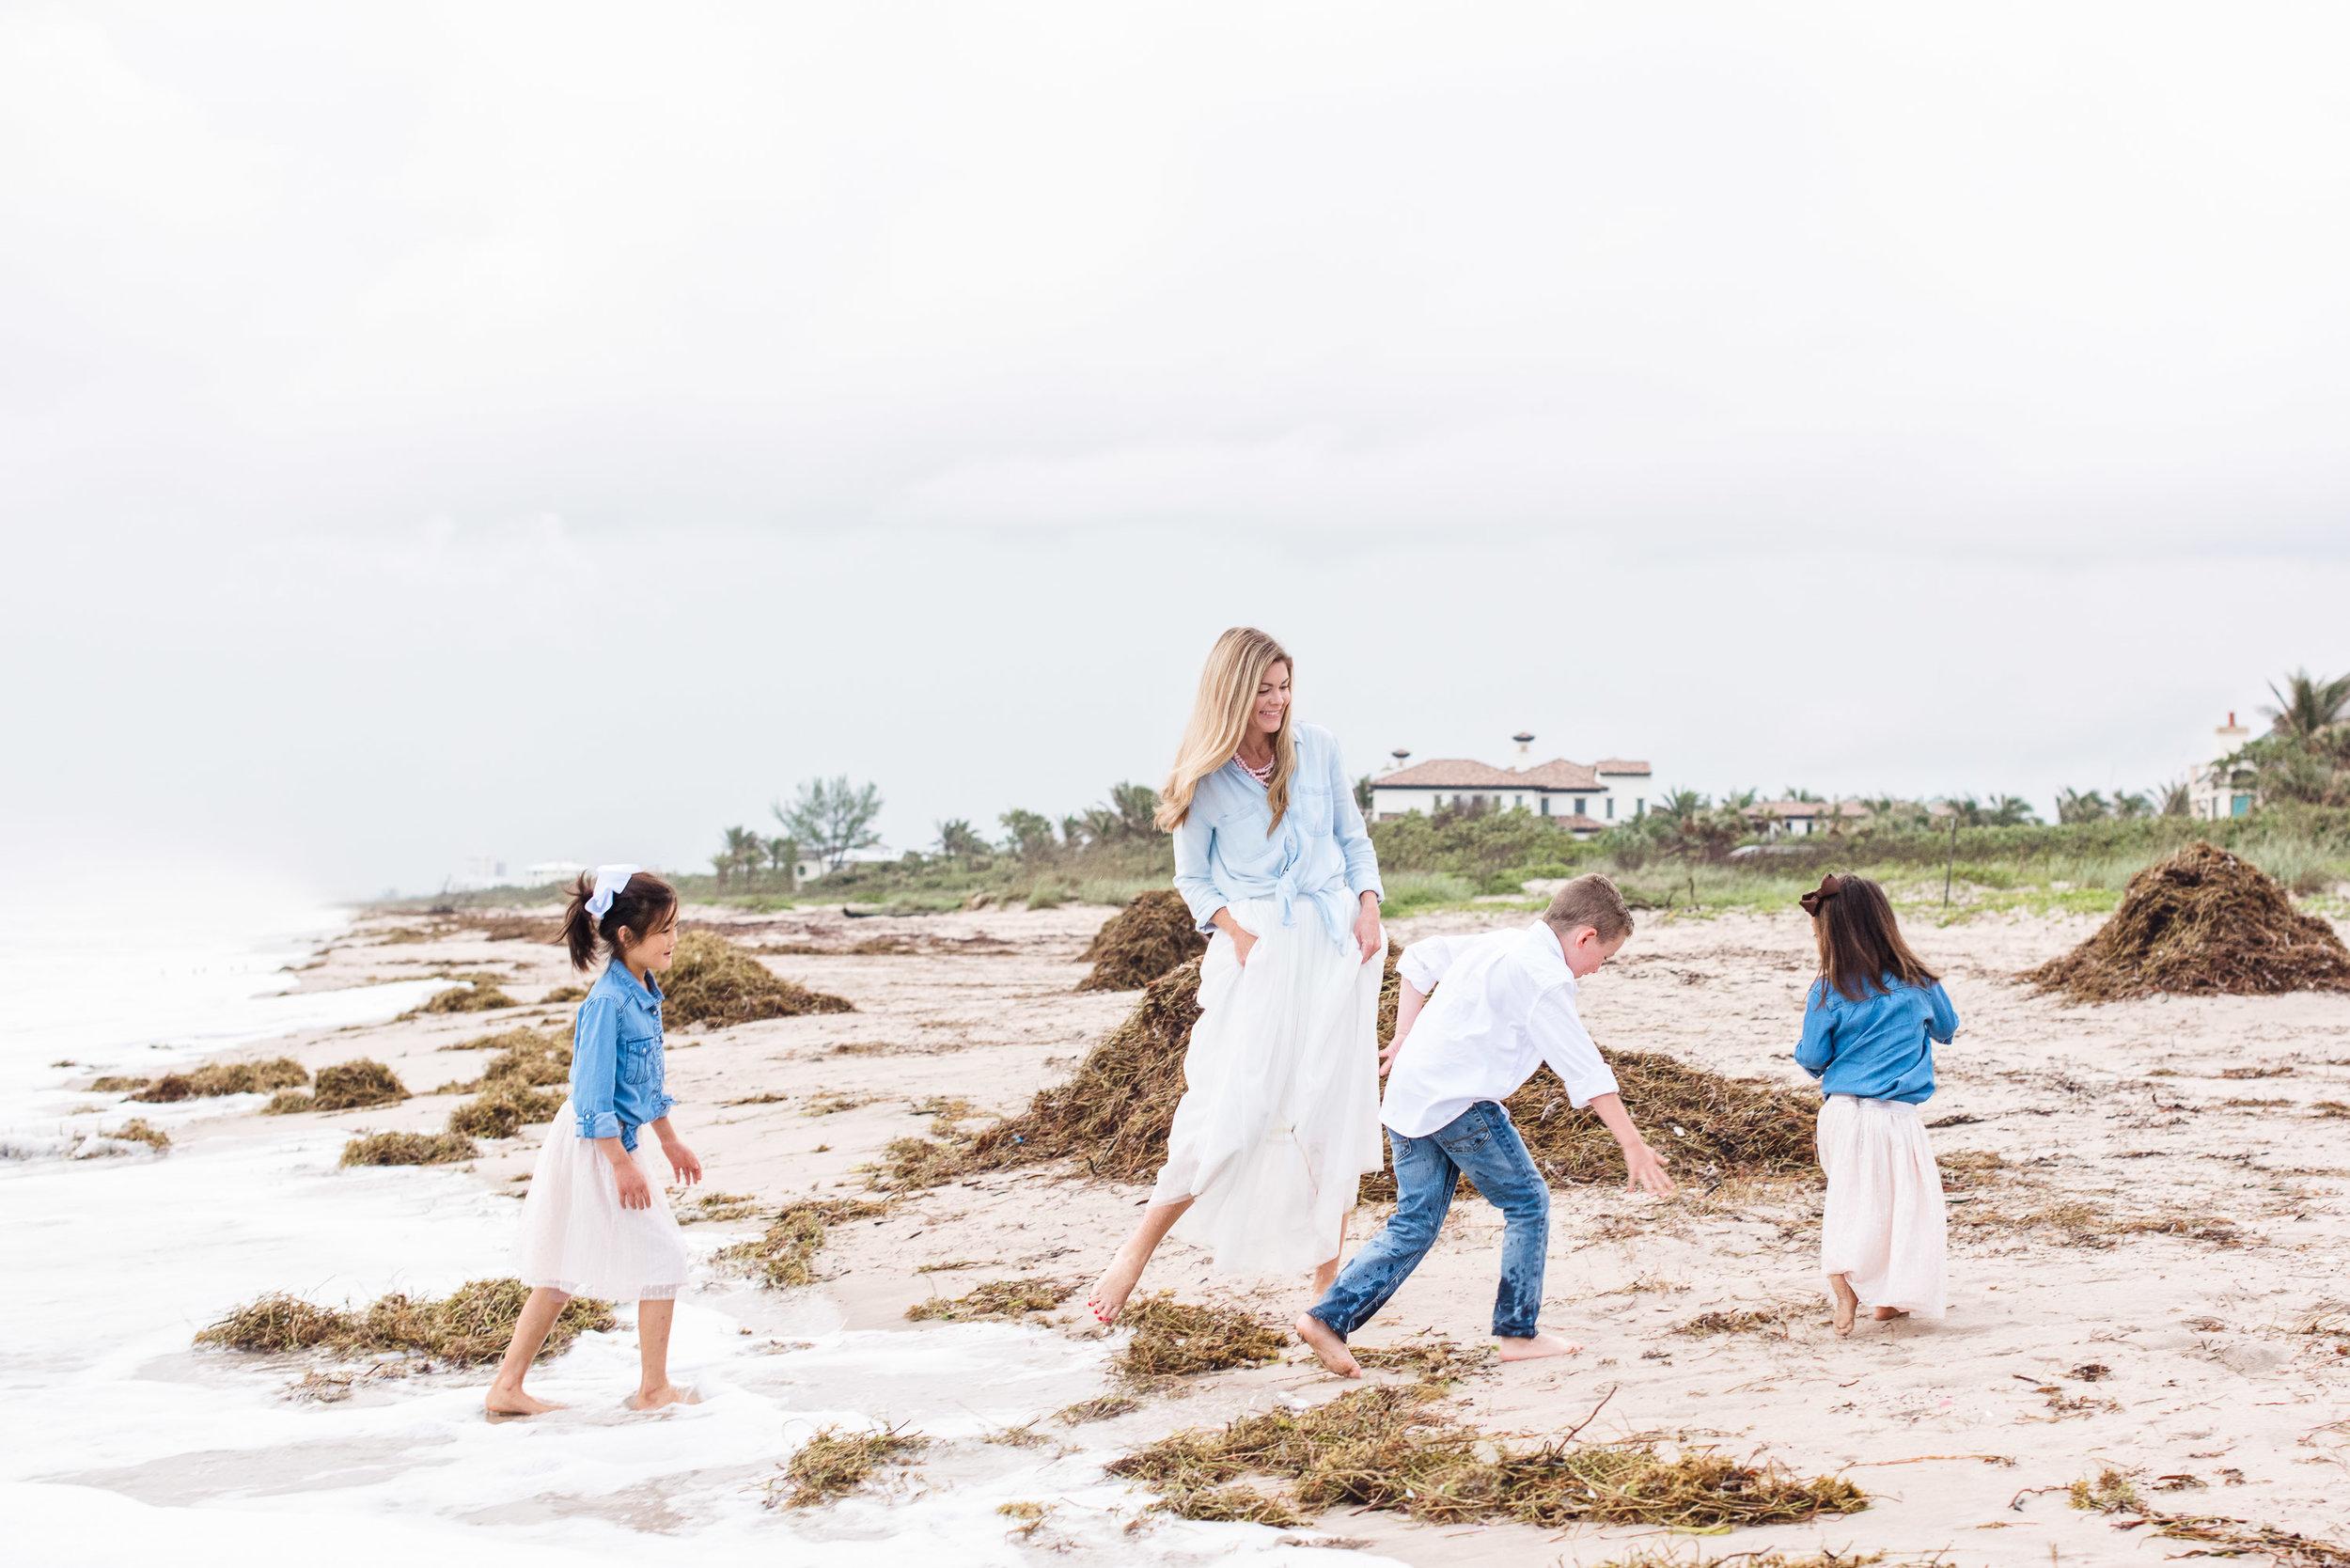 vero-beach-family-photographer-beach-session10.jpg